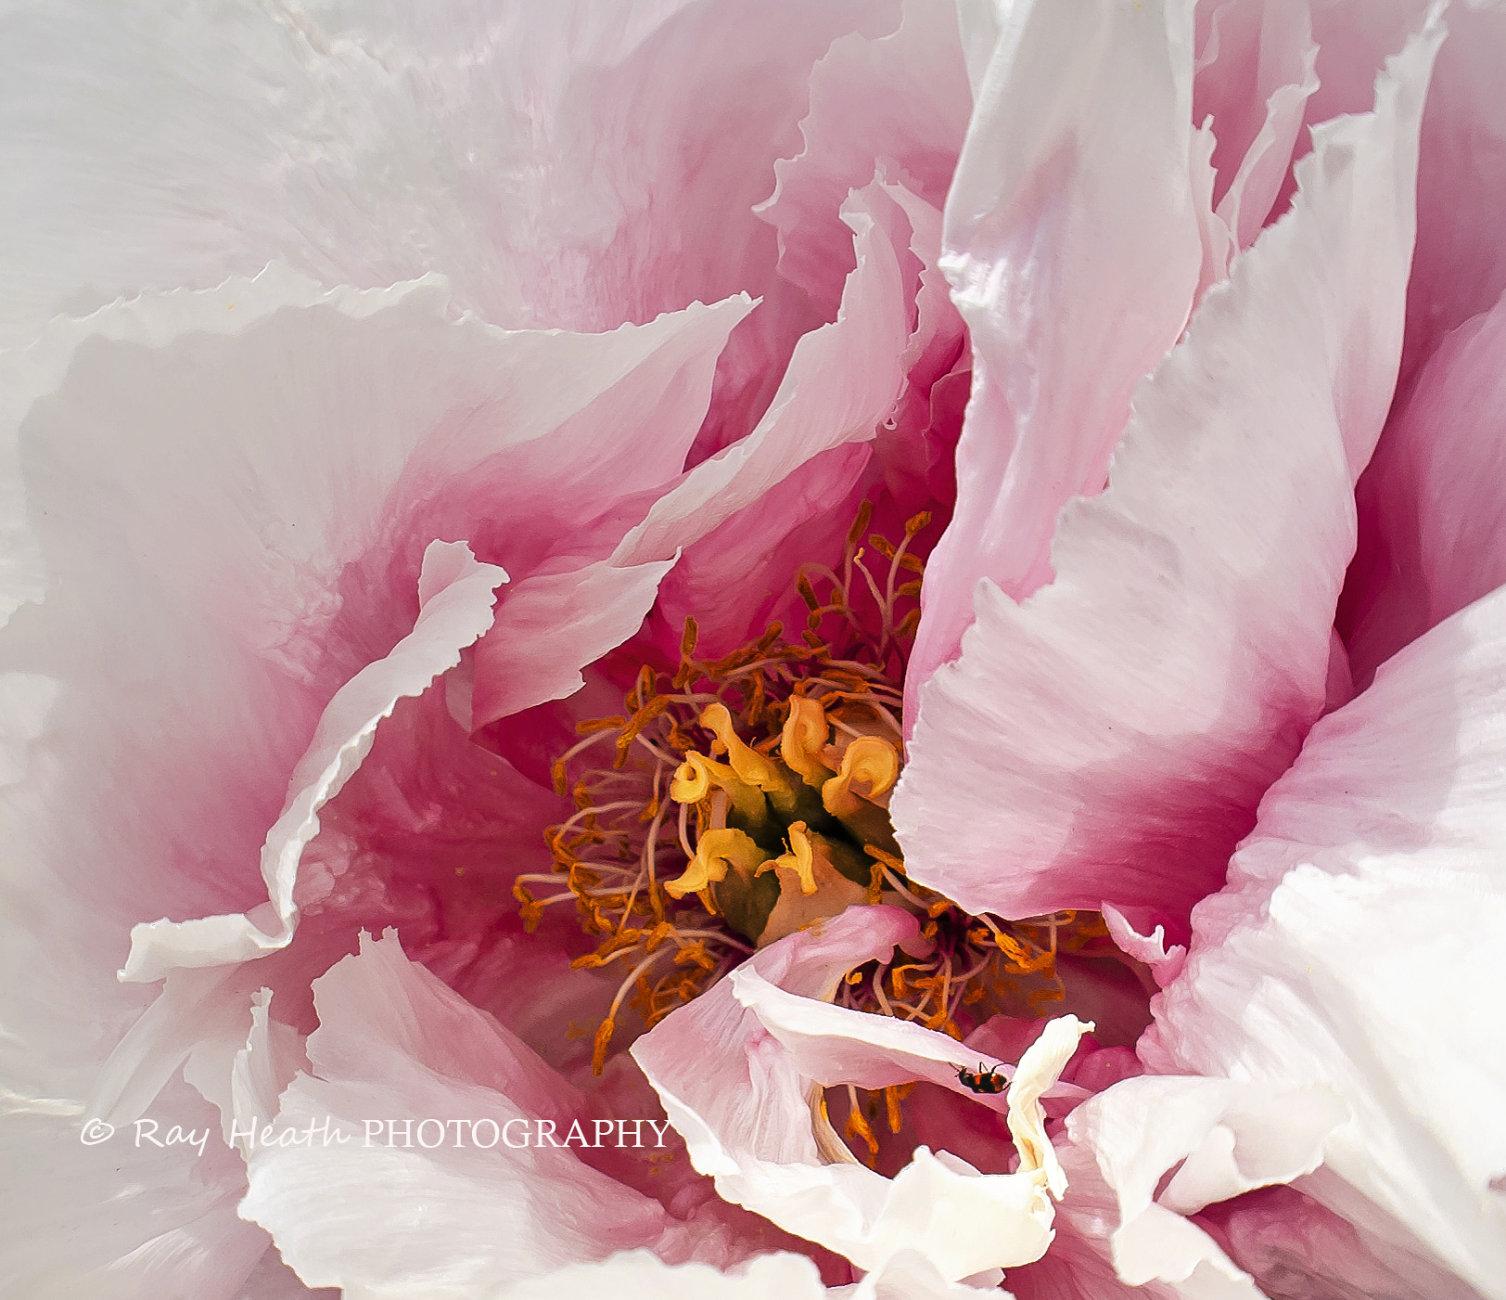 Bug in flower centre - digital art flower abstract